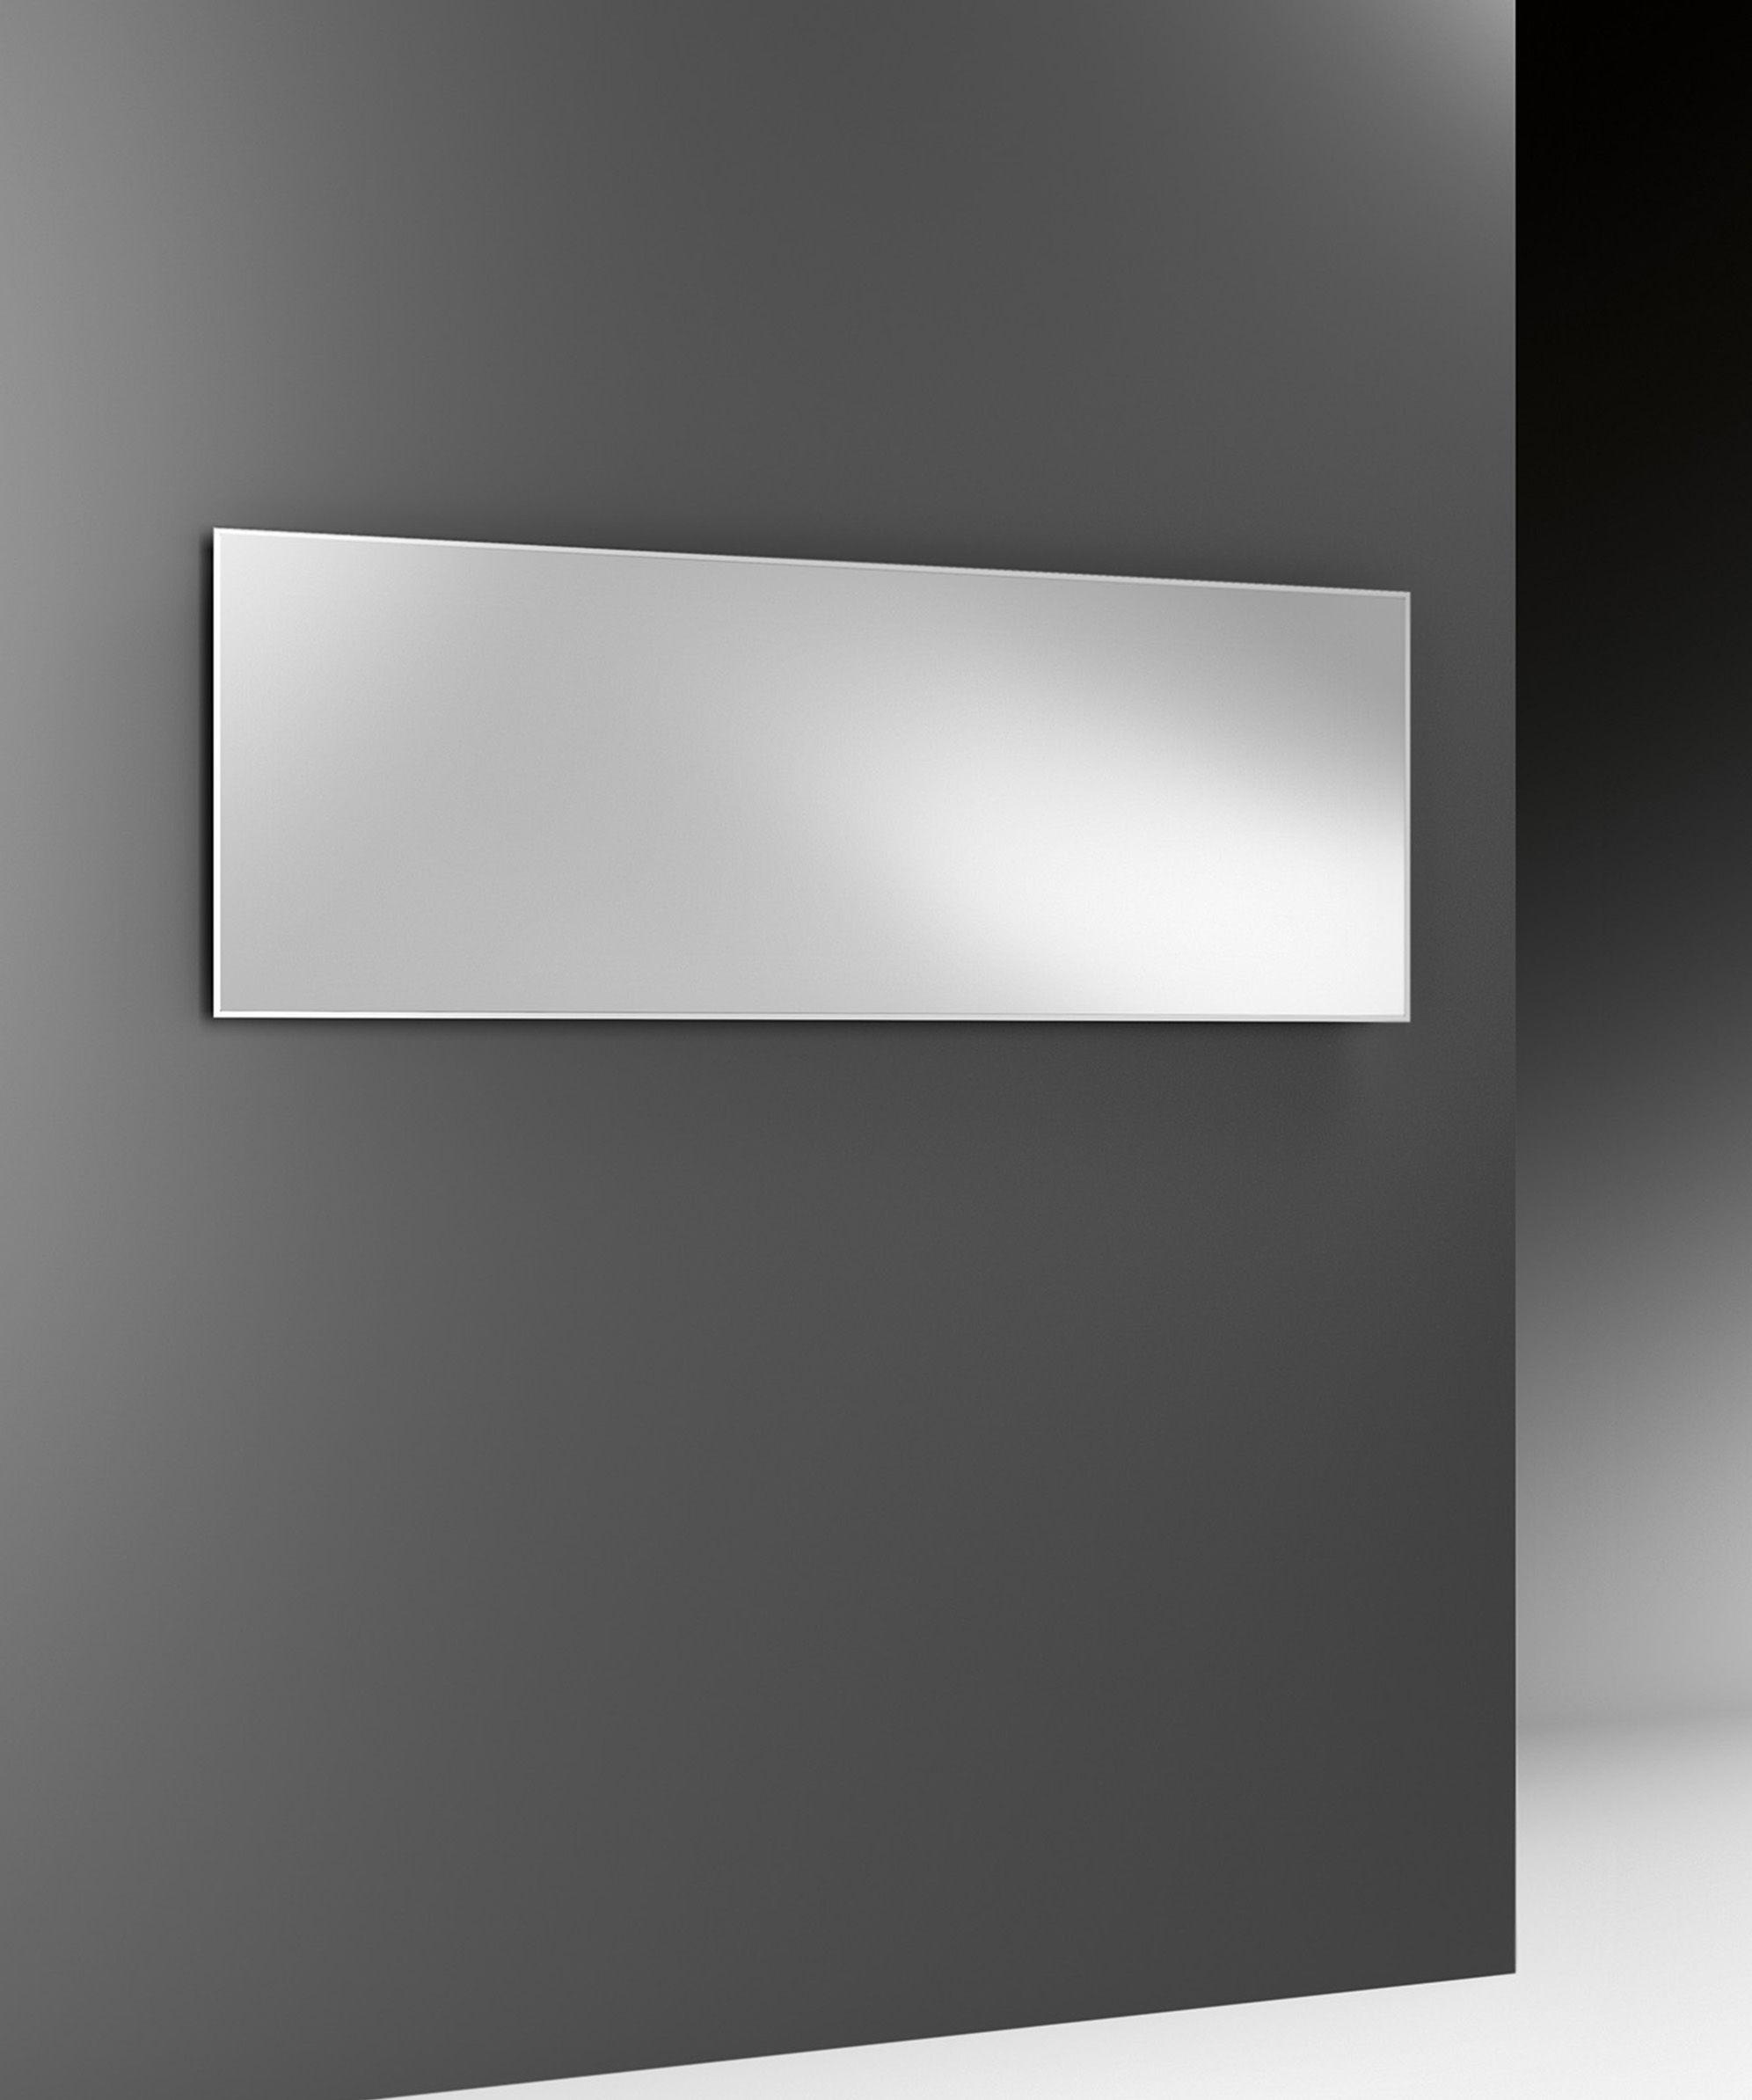 Miroir mirage 120 x 40 cm miroir fiam for Miroir 40x120